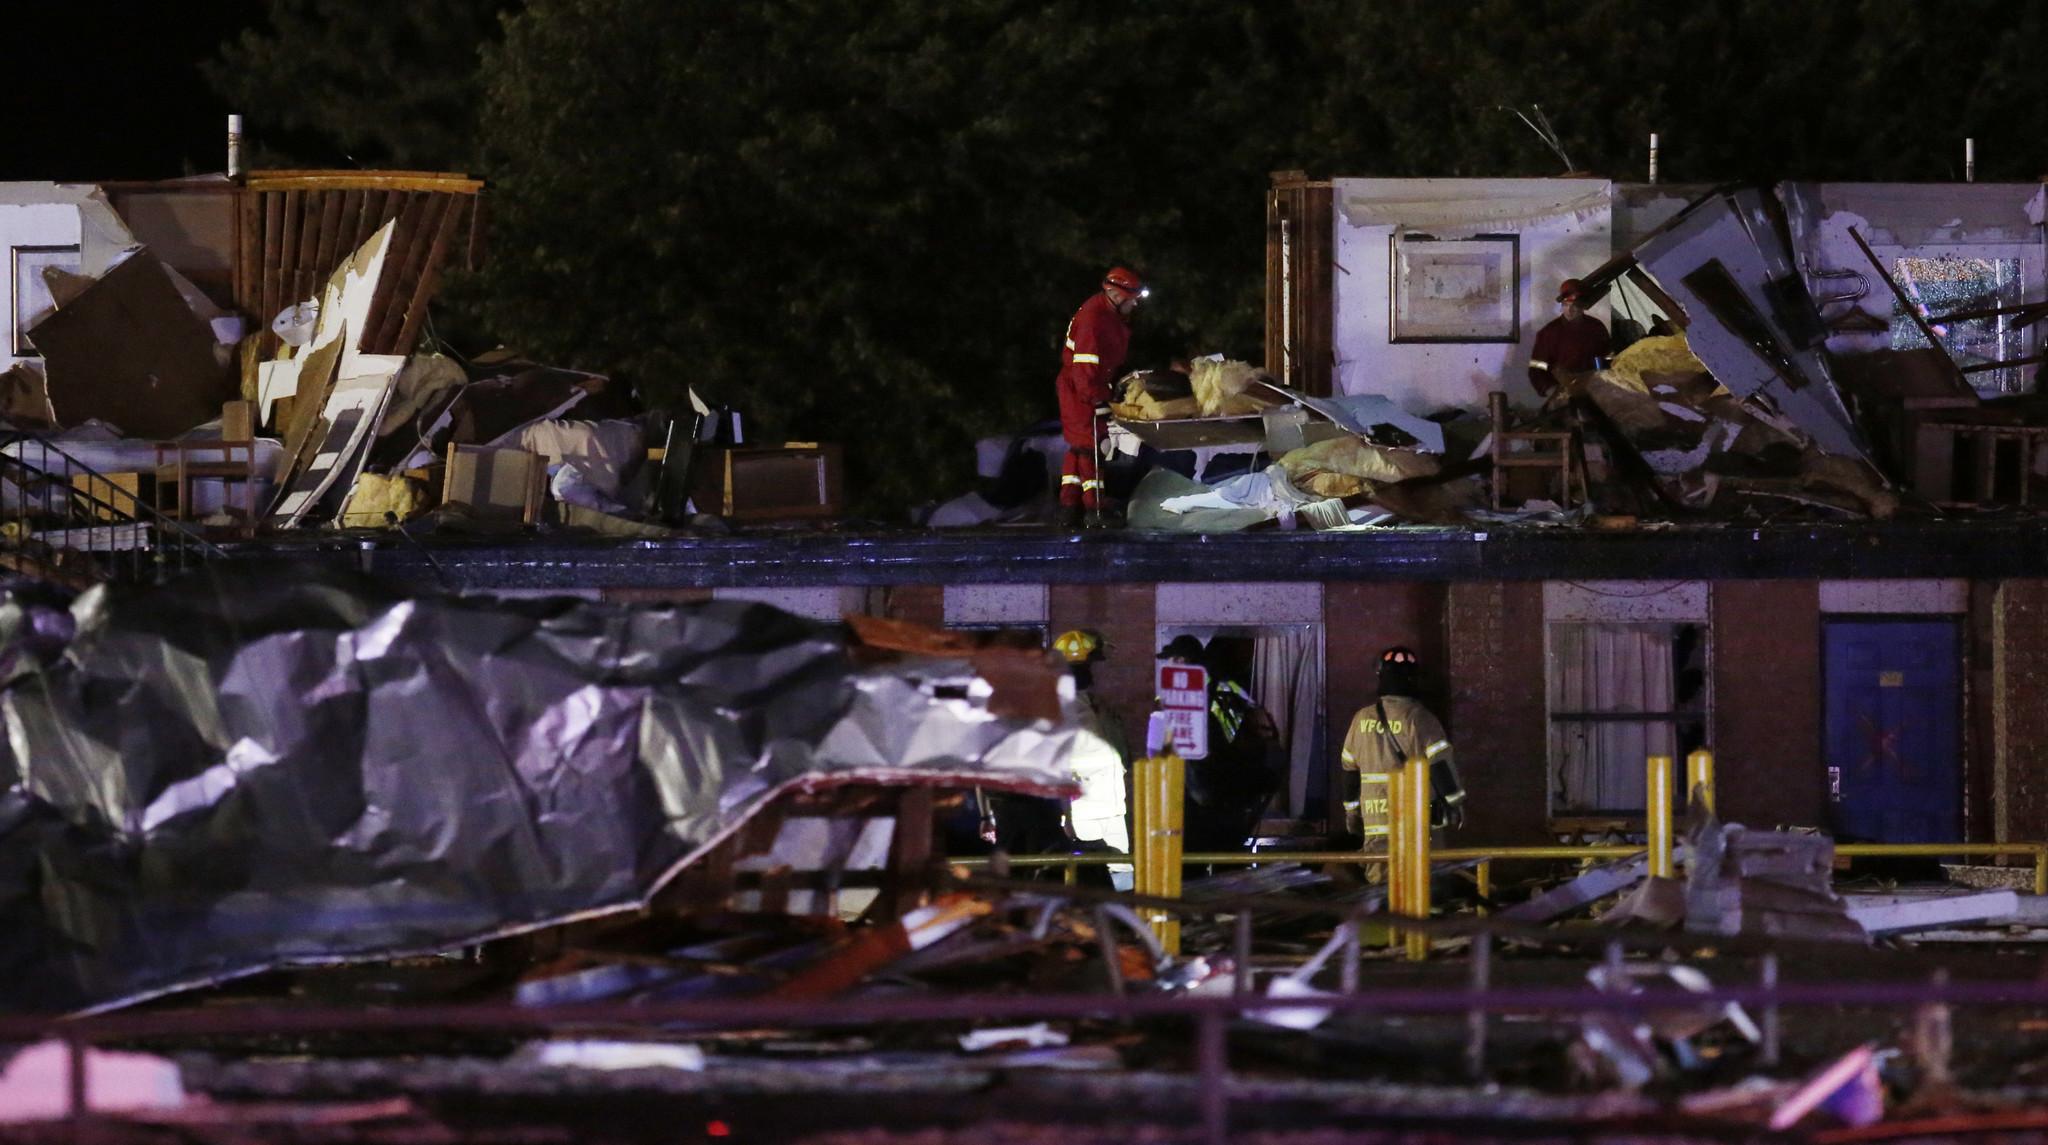 Tornado rips through Oklahoma town, killing 2 and injuring dozens